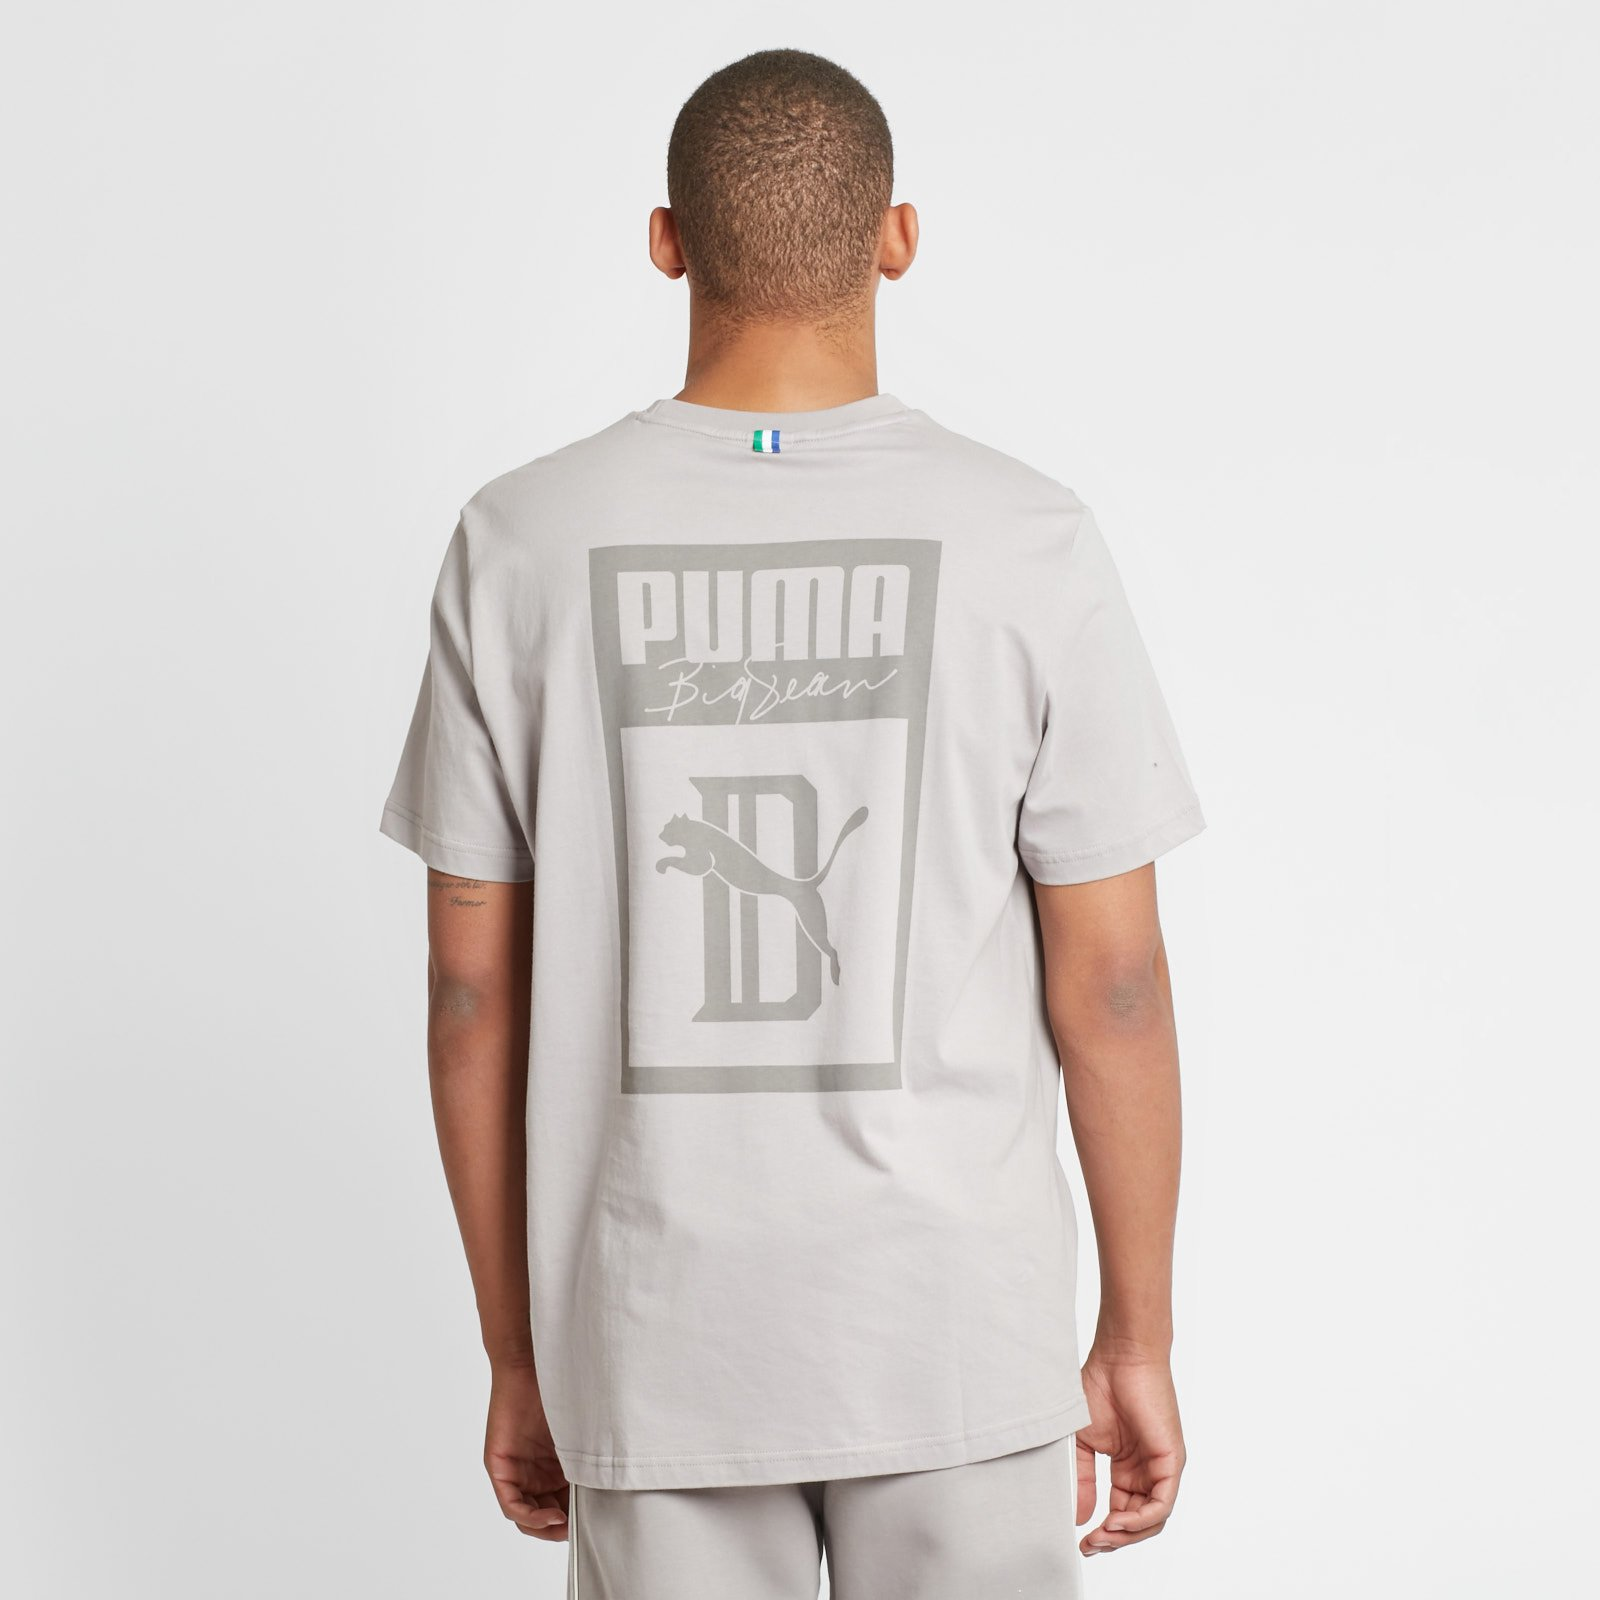 951beea56d Puma Logo Tee x Big Sean - 575919-12 - Sneakersnstuff | sneakers ...